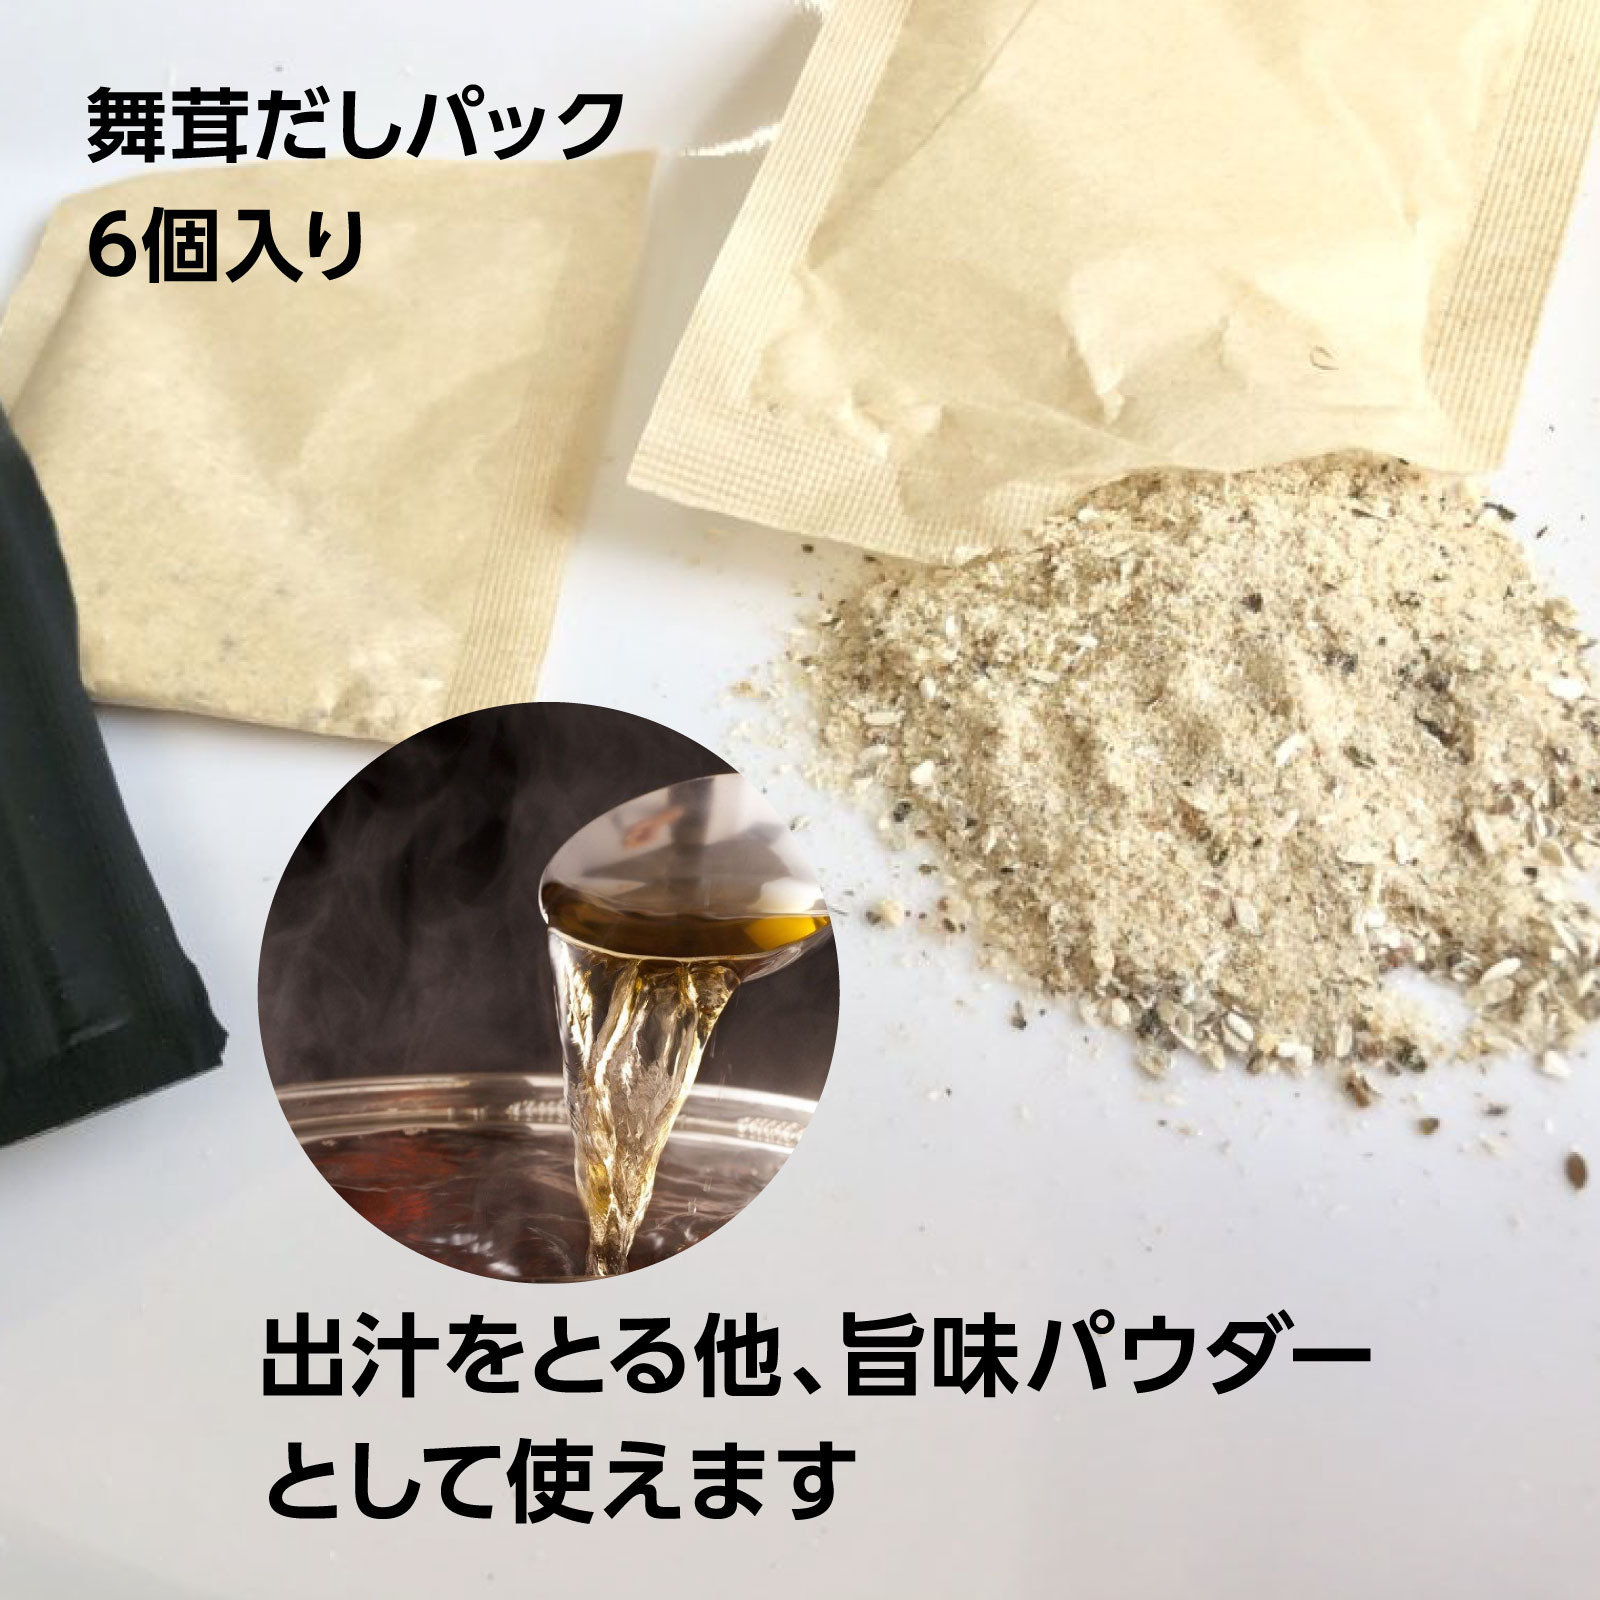 丹波山倶楽部の舞茸香油